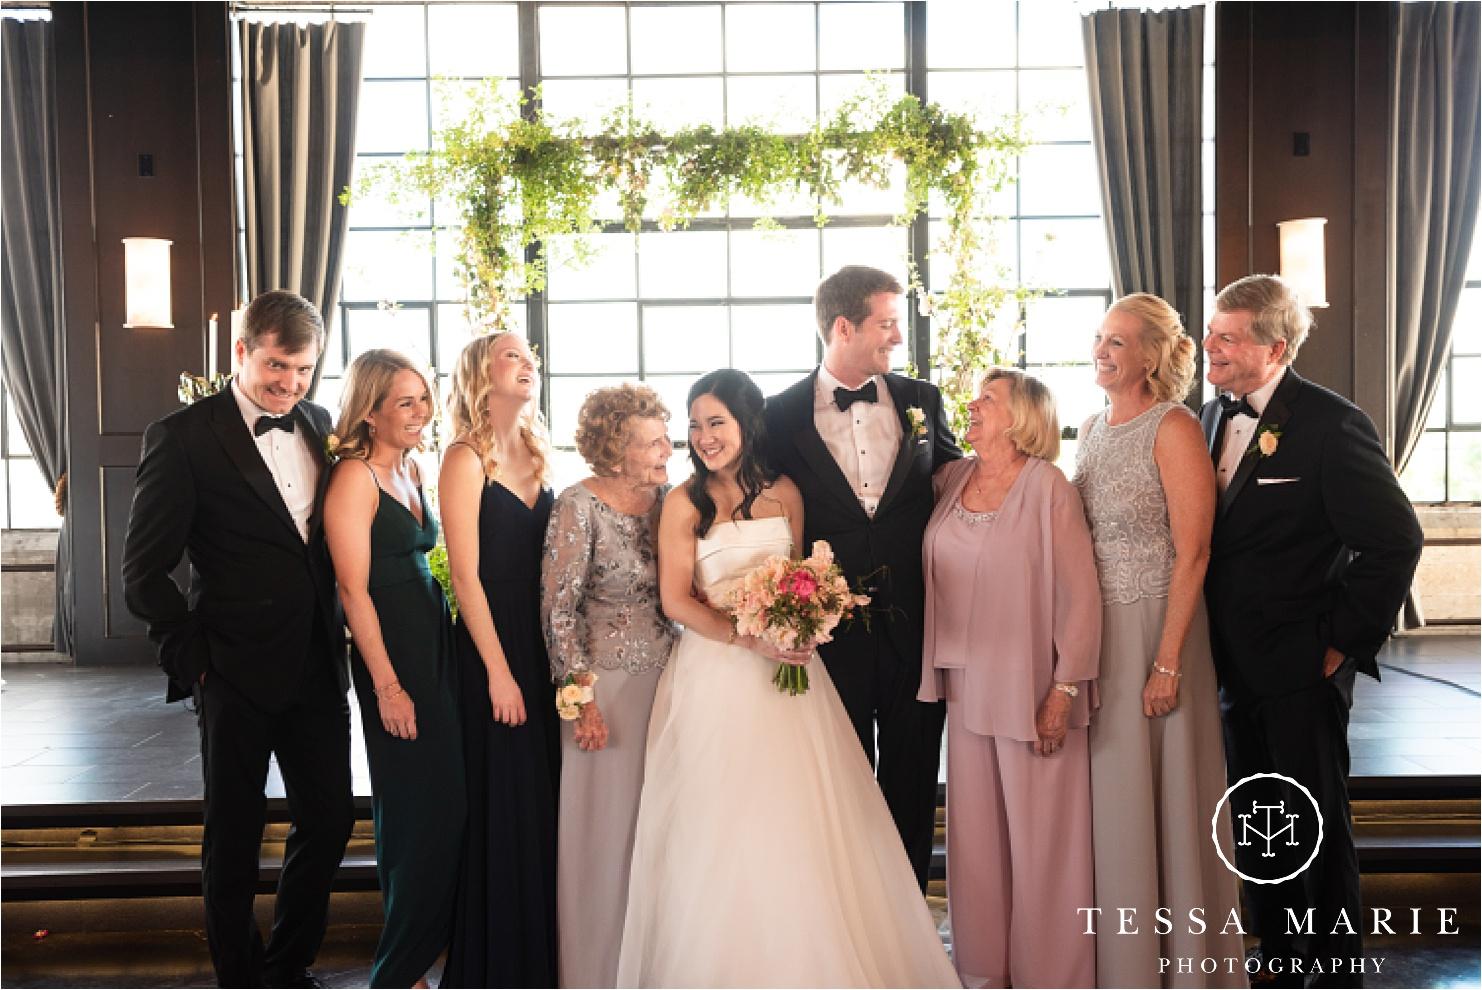 Tessa_marie_weddings_houston_wedding_photographer_The_astorian_0132.jpg